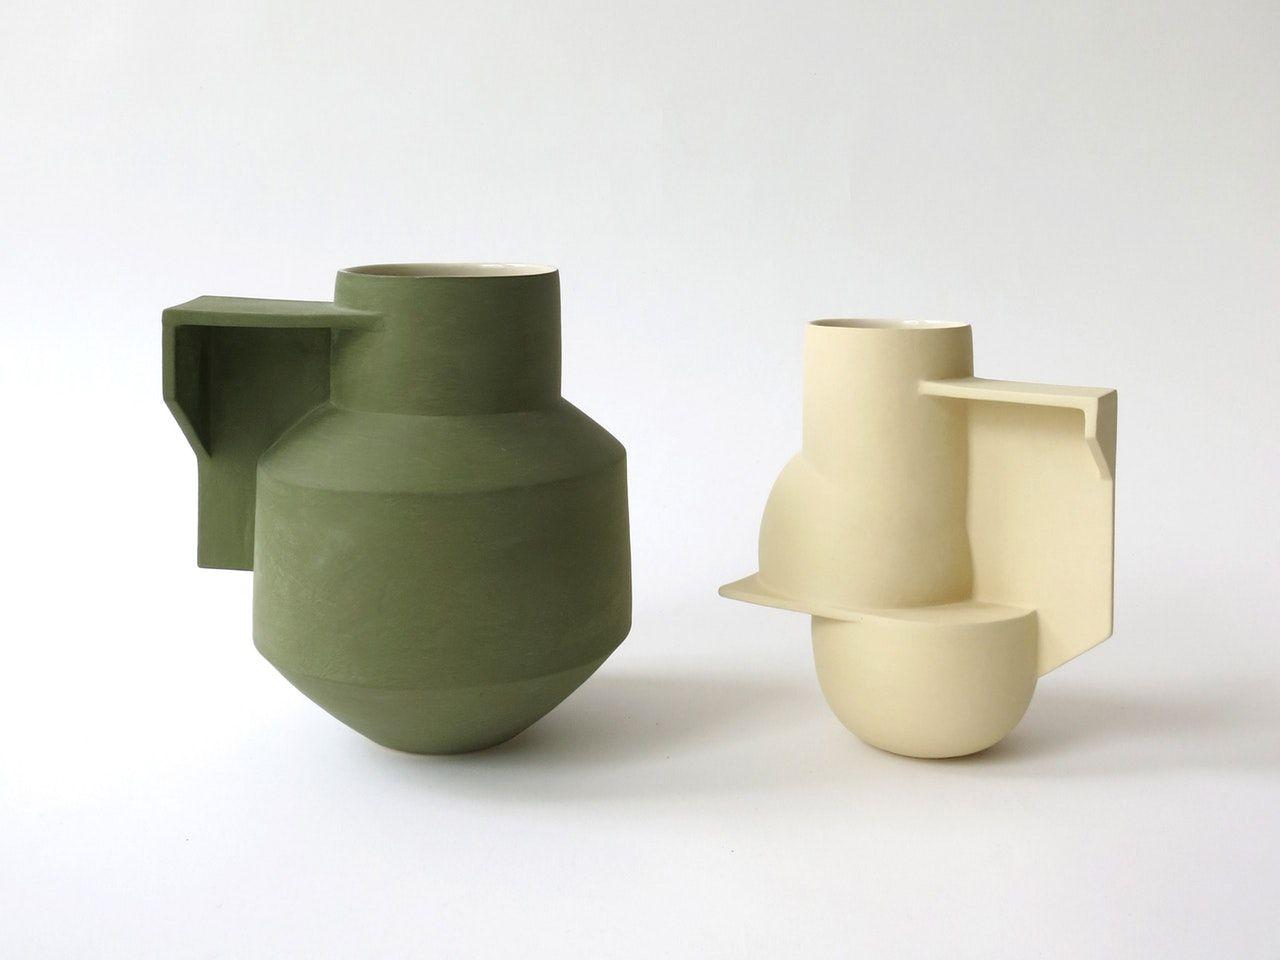 Derek Wilson Japanese Aesthetic Contemporary Crafts Ceramics